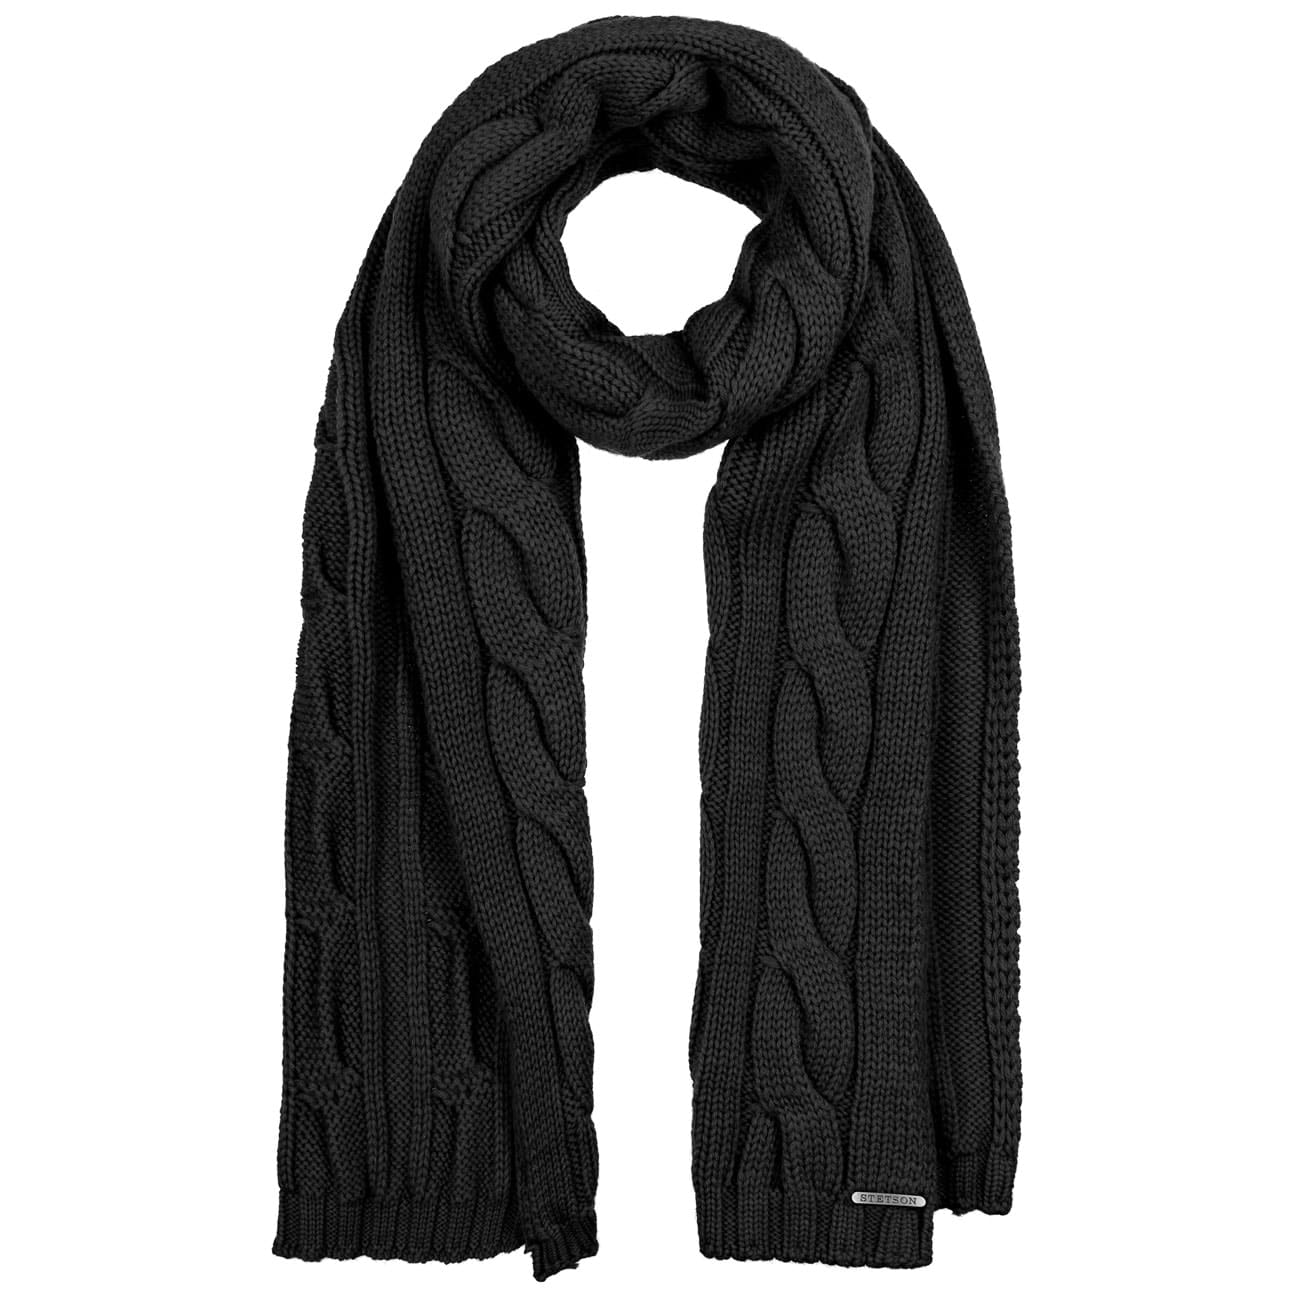 Bufanda Lumberton Virgin Wool by Stetson  bufanda de invierno